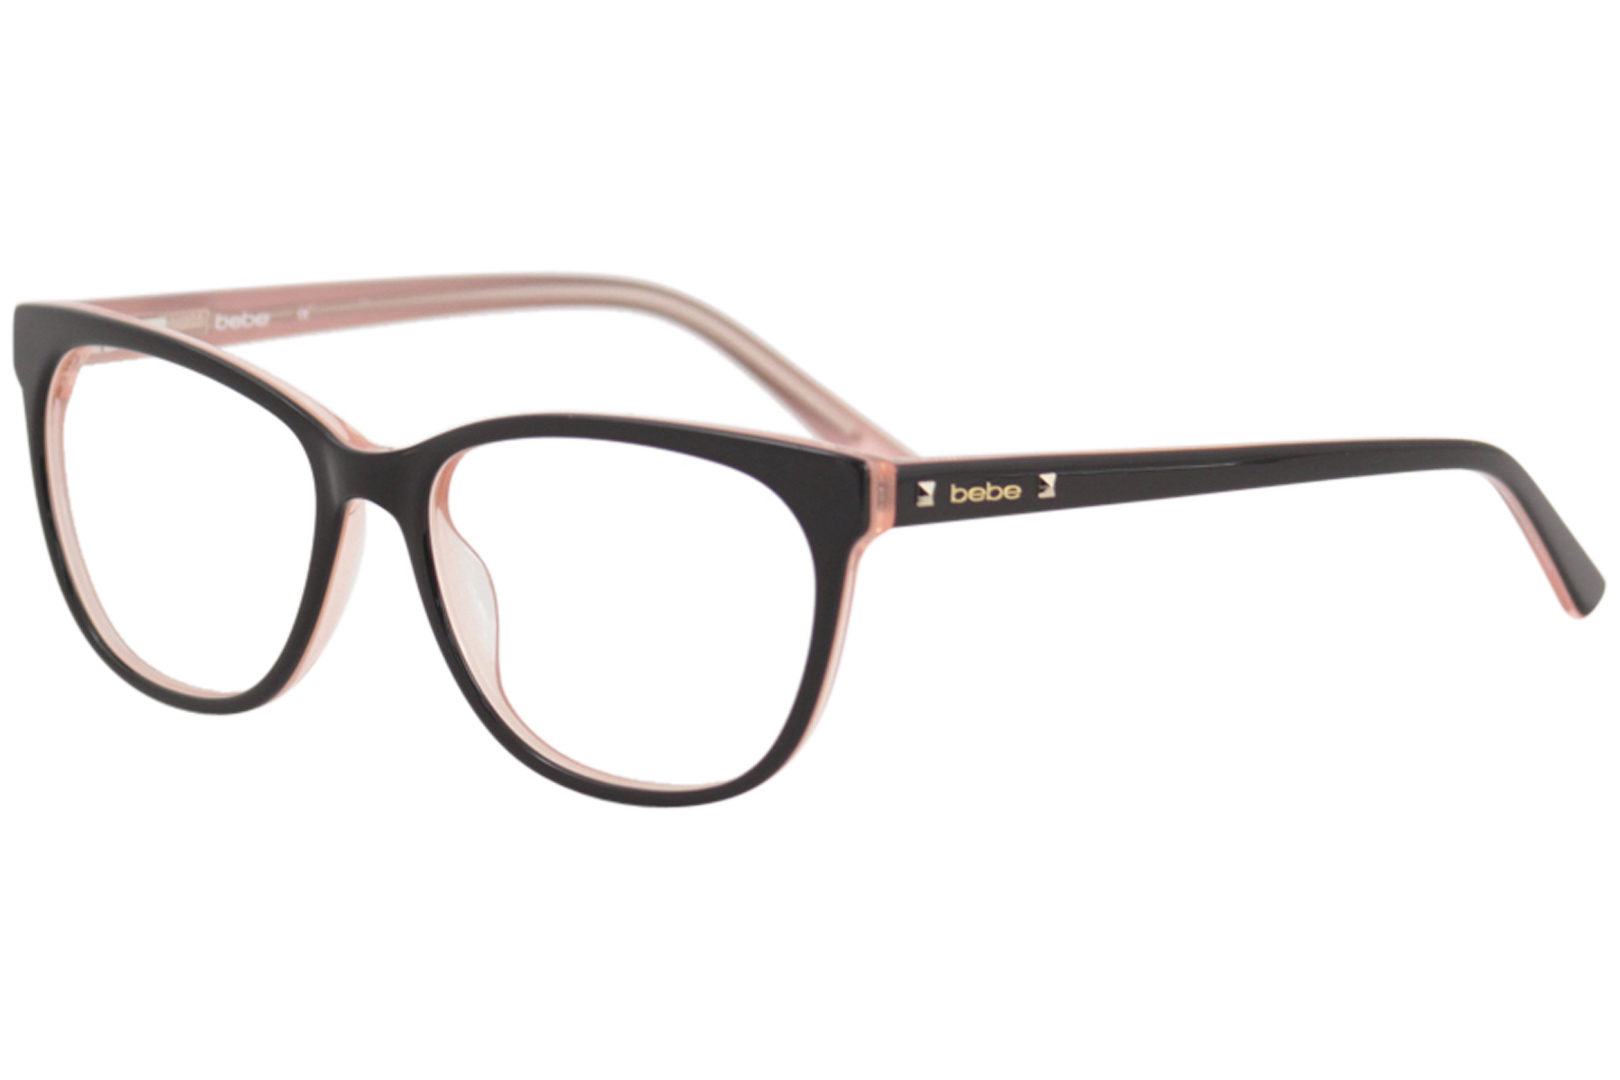 8a1e369e323 Bebe Women s Popular Eyeglasses BB5108 BB 5108 210 Topaz Optical ...